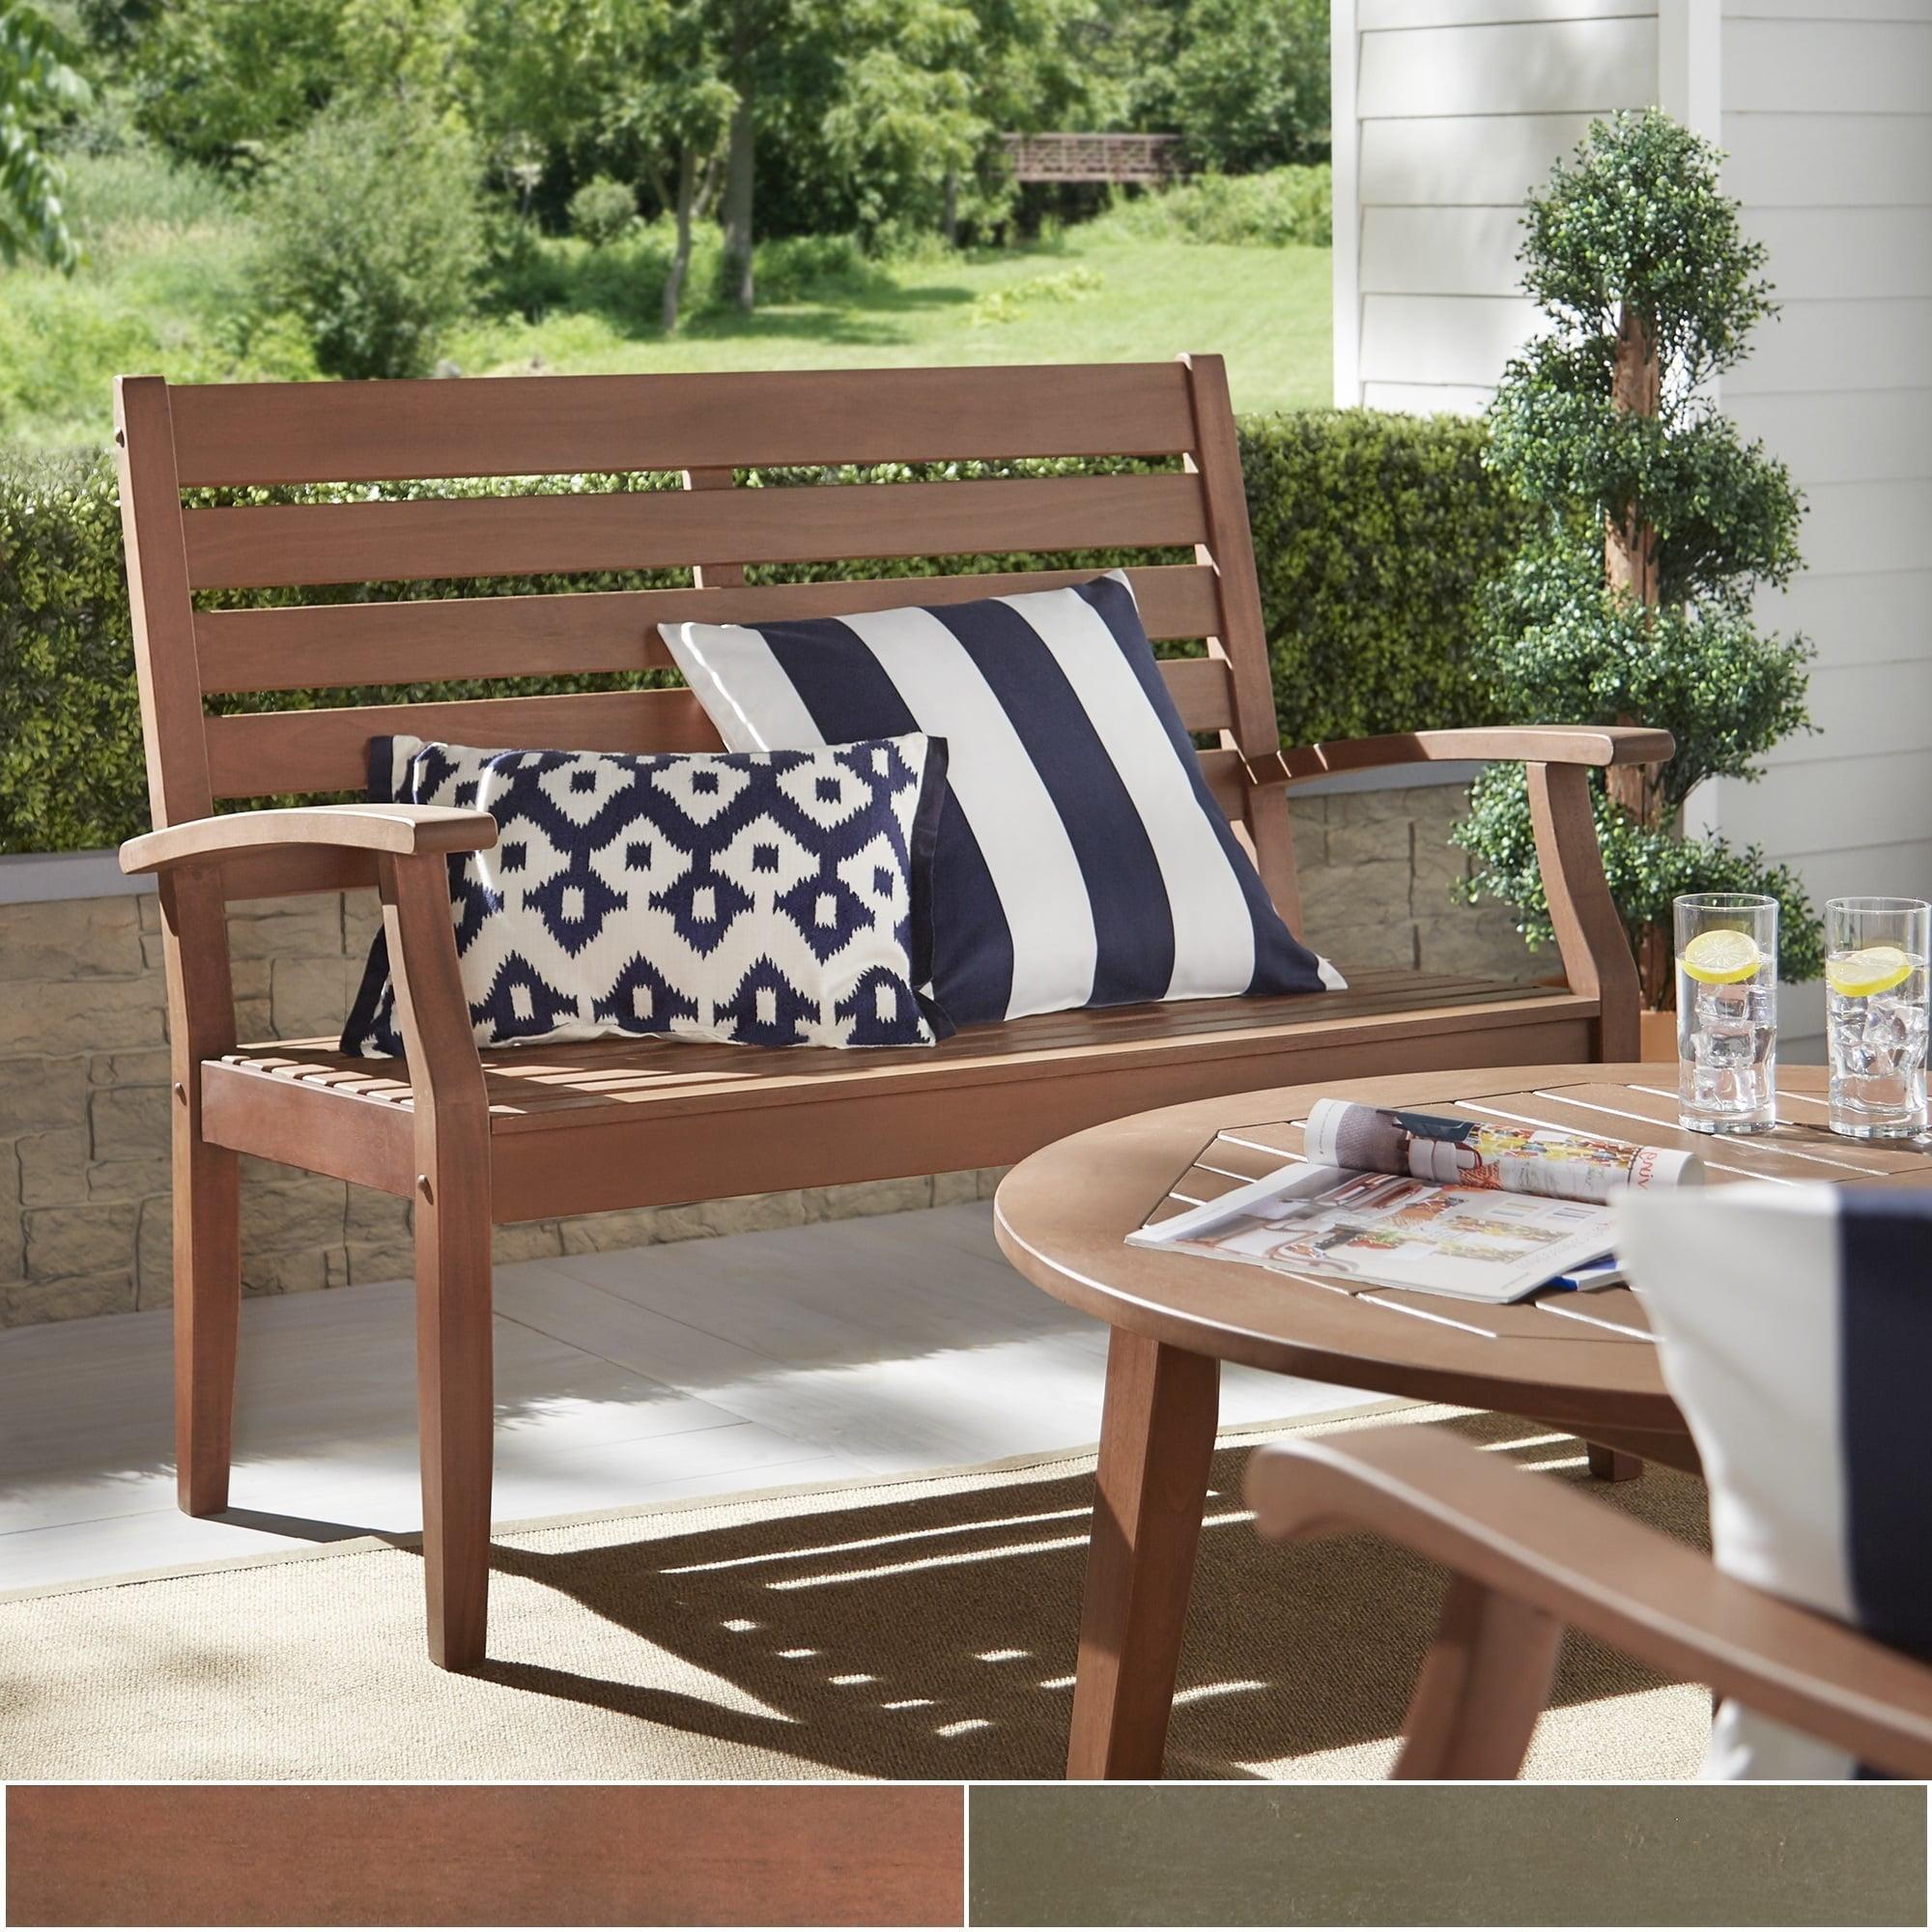 iNSPIRE Q Yasawa Wood Outdoor Garden Ladder Back Bench by...